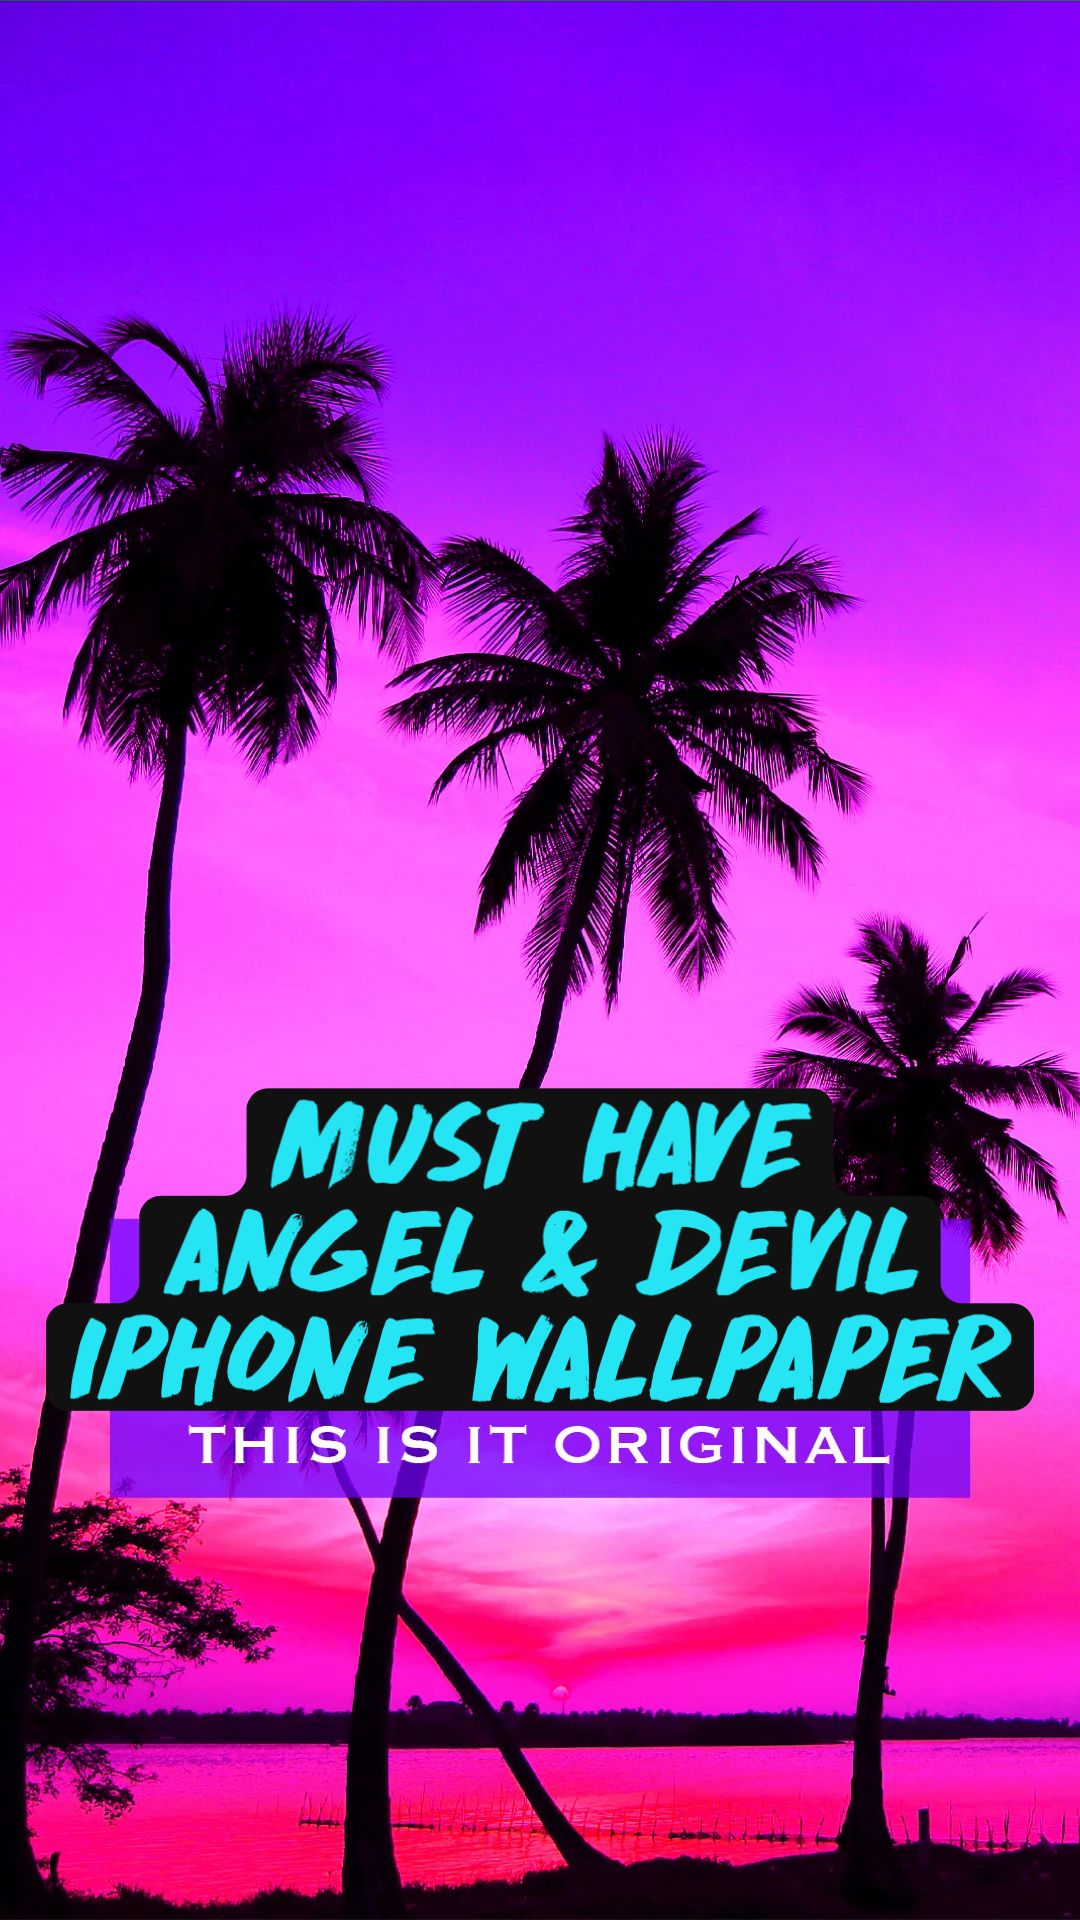 MUST HAVE ANGEL & DEVIL IPHONE WALLPAPER